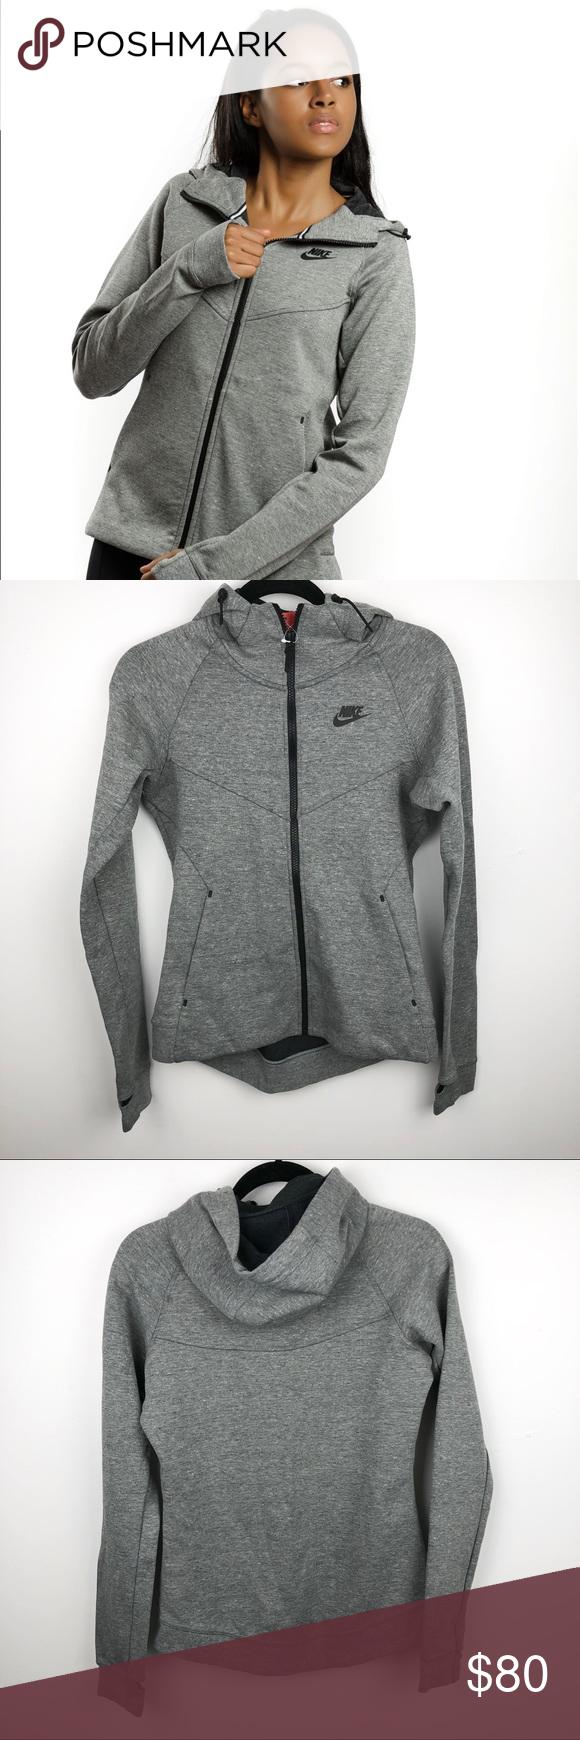 Women's Nike Tech Fleece Grey Hoodie Nike tech fleece